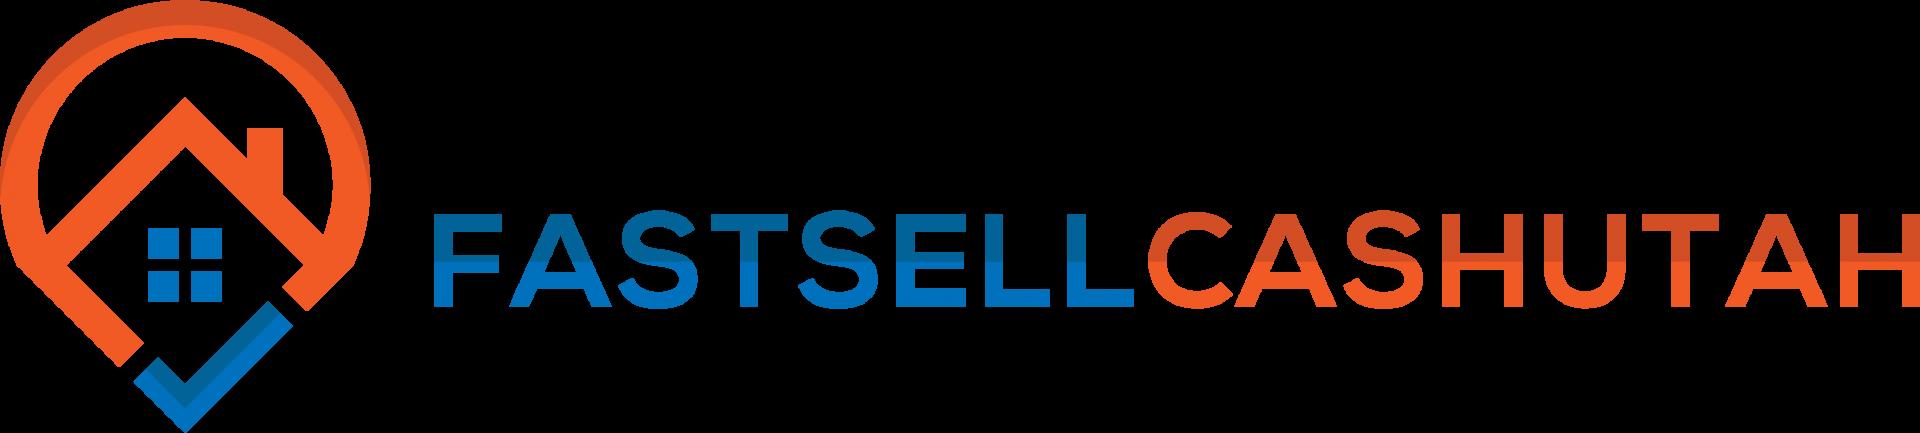 fastsellcashutah.com logo